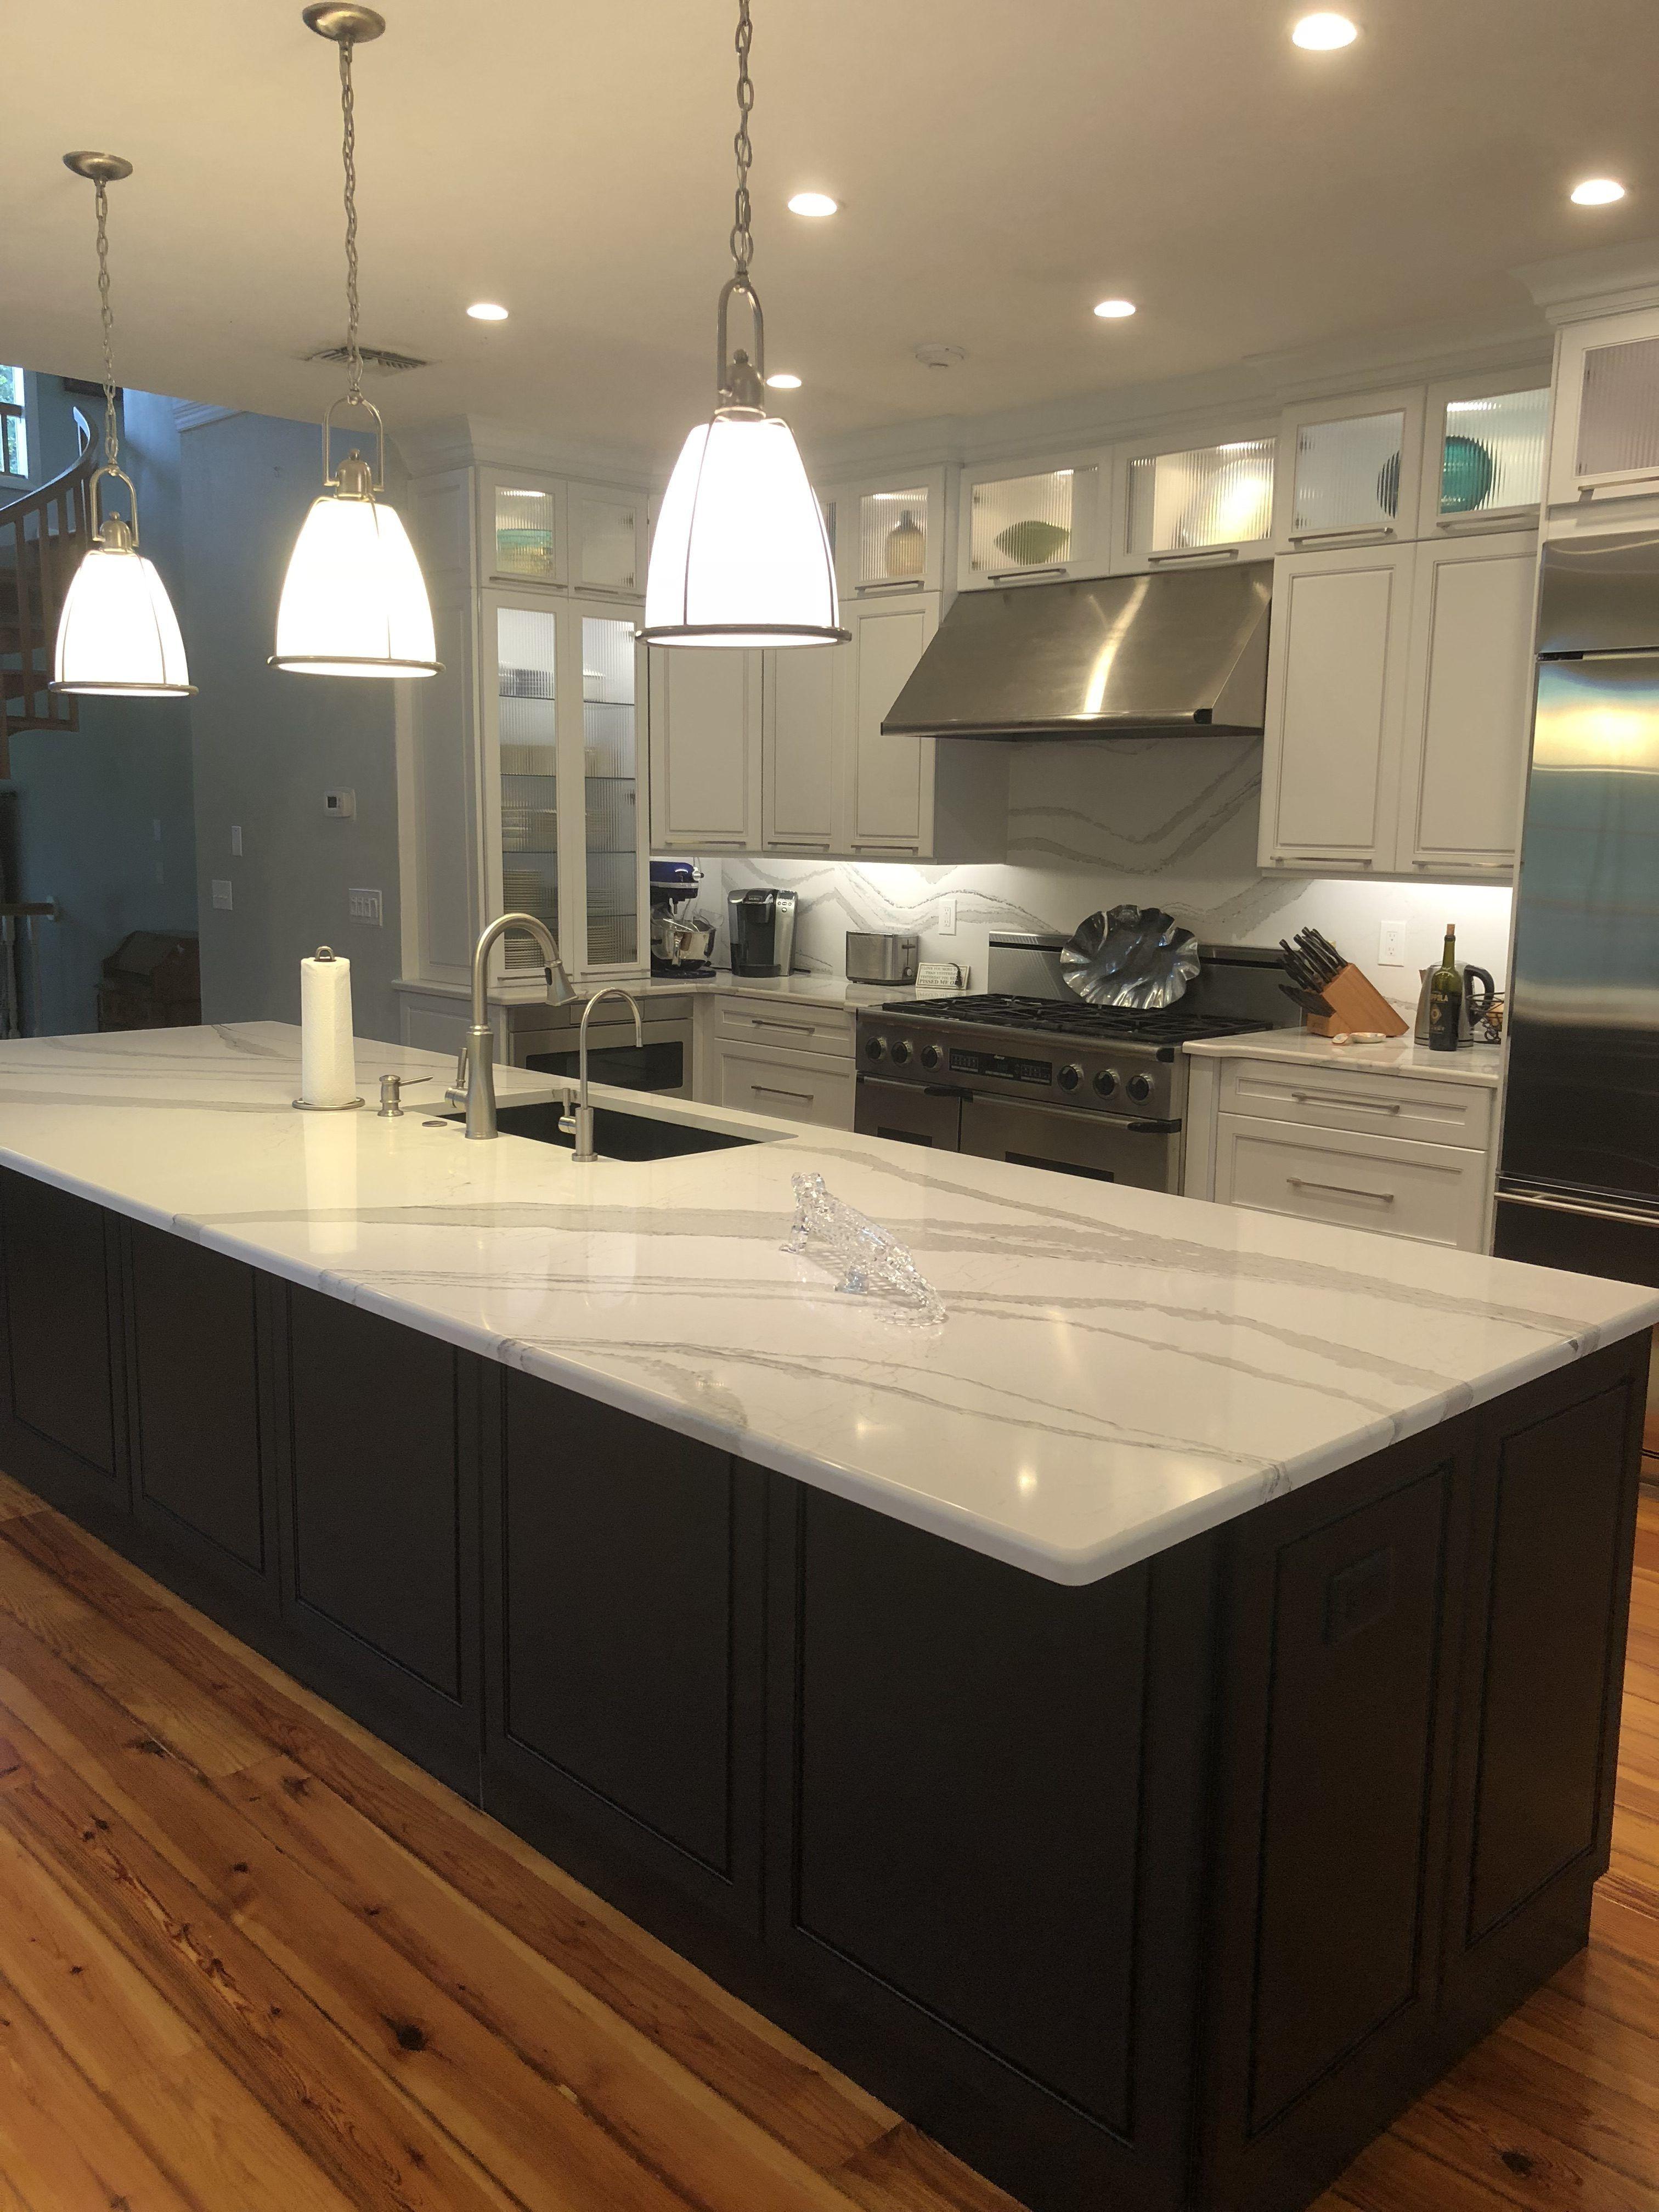 kitchen and bath gallery, sarasota, fl | kirkplan kitchens